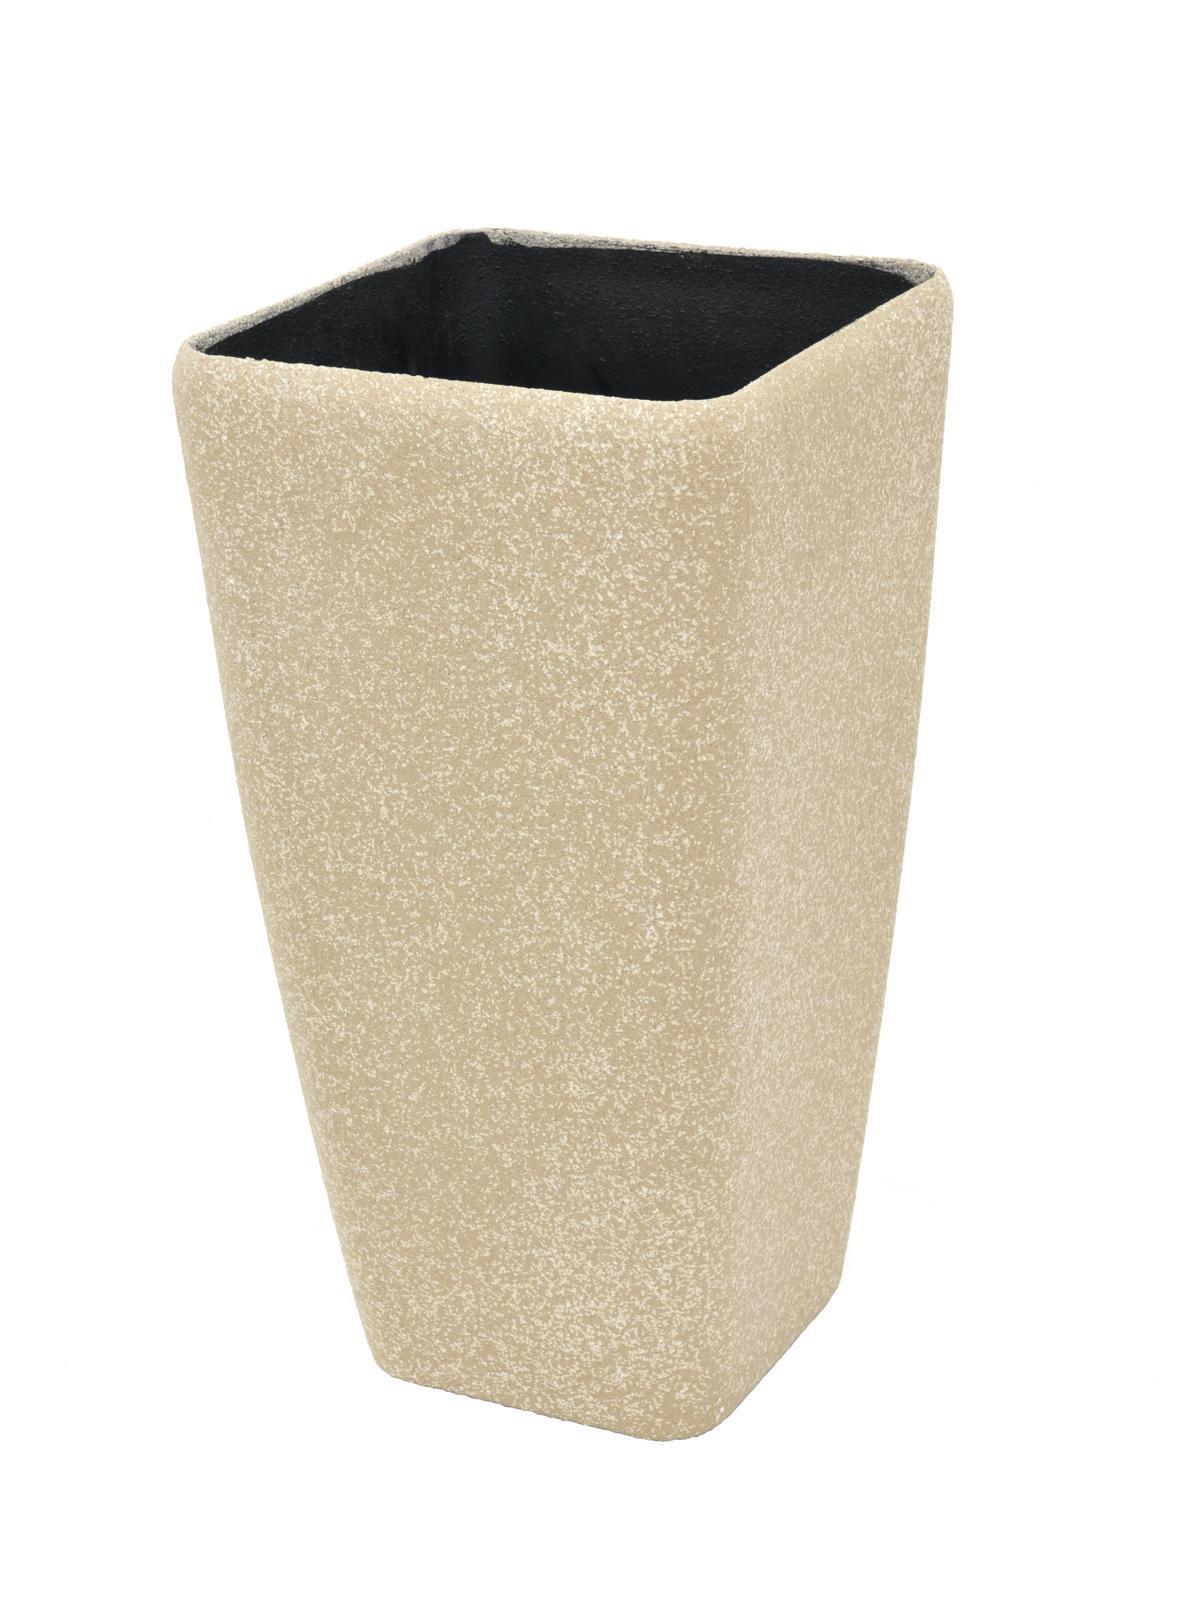 EUROPALMS Deco cachepot STONA-41, cubi, beige